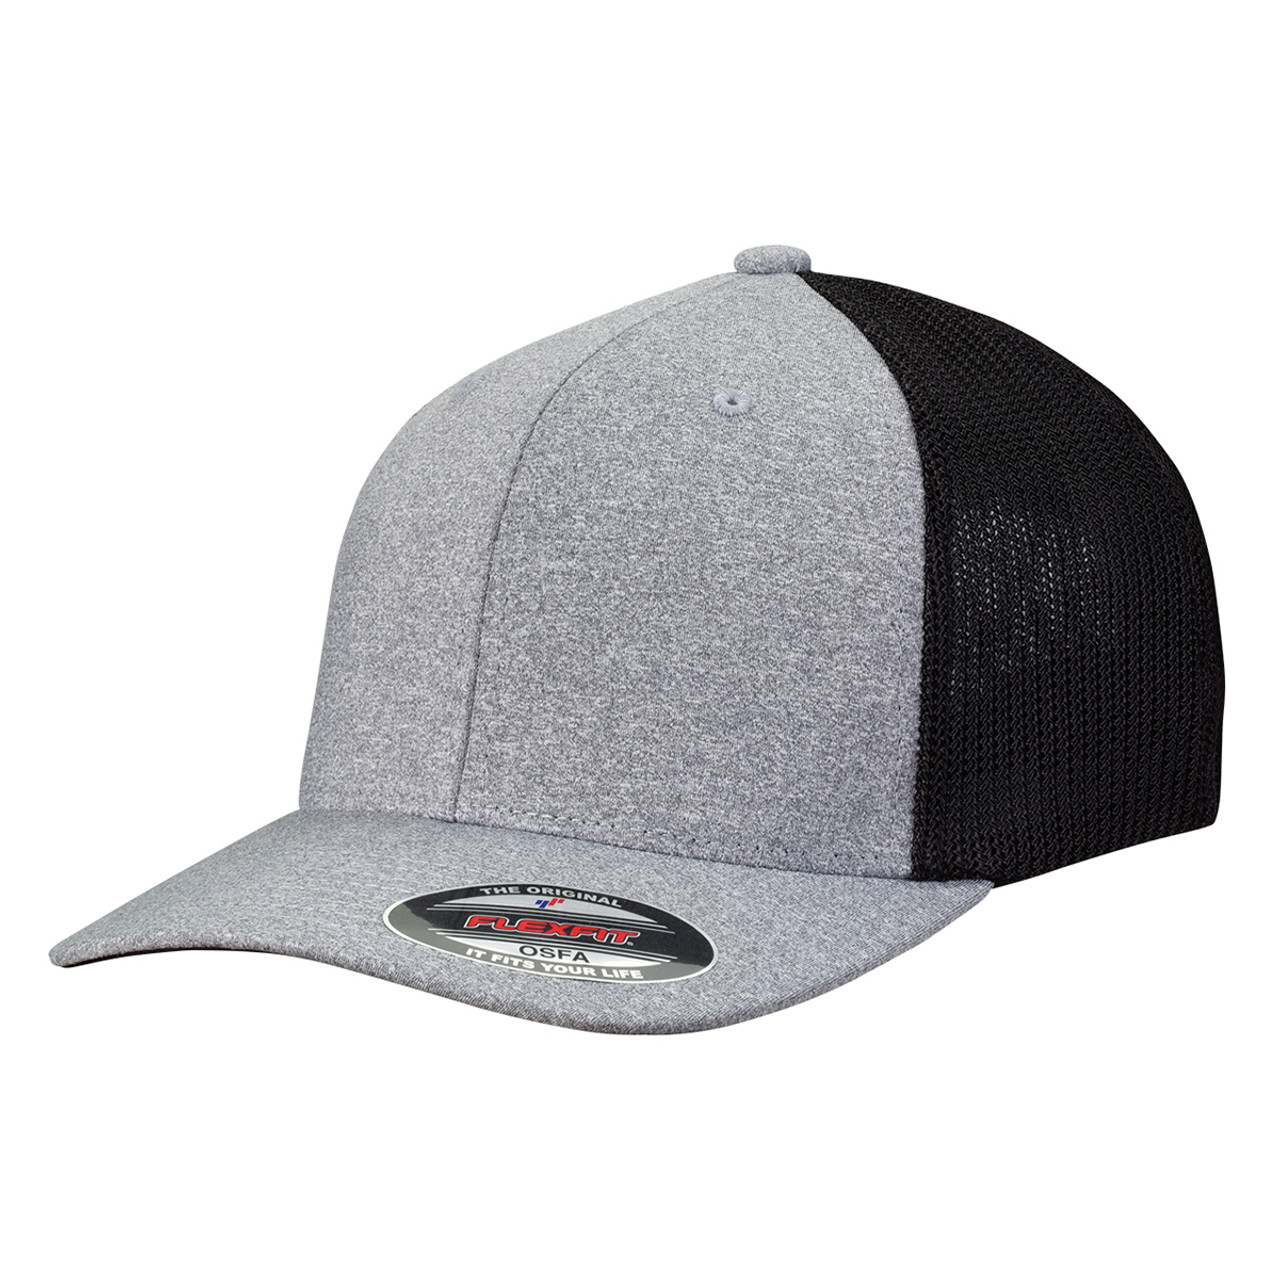 Heather/Black - FF6311 Flexfit Melange Mesh Trucker Cap | T-shirt.ca